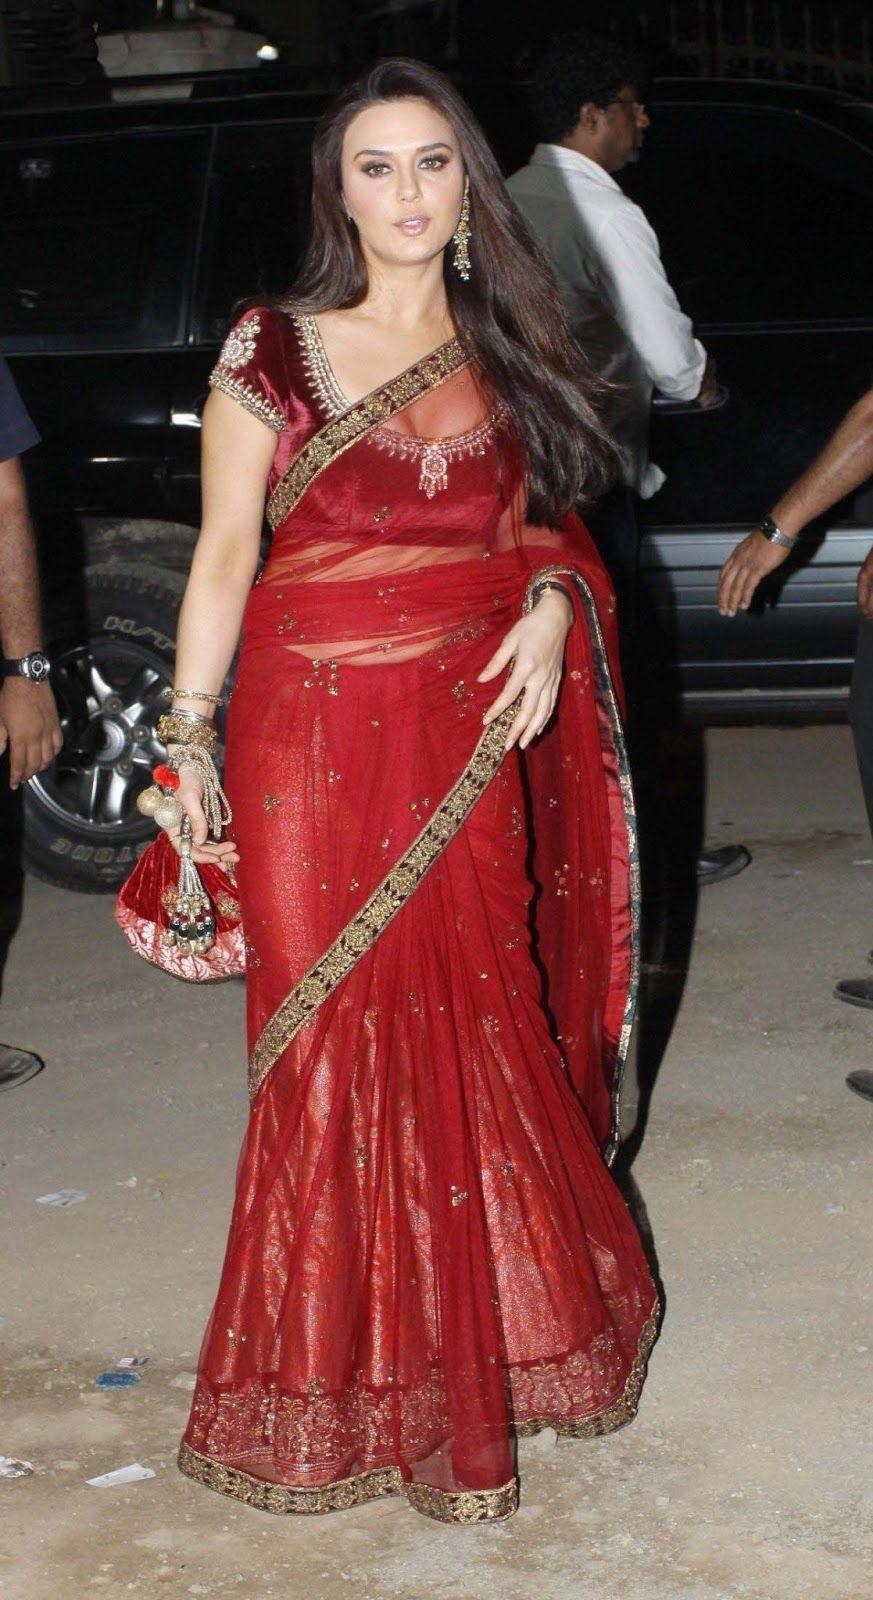 Preity Zinta Saree  Preity-Zinta-Very-Hot-And-Sexy-In-Red -6059